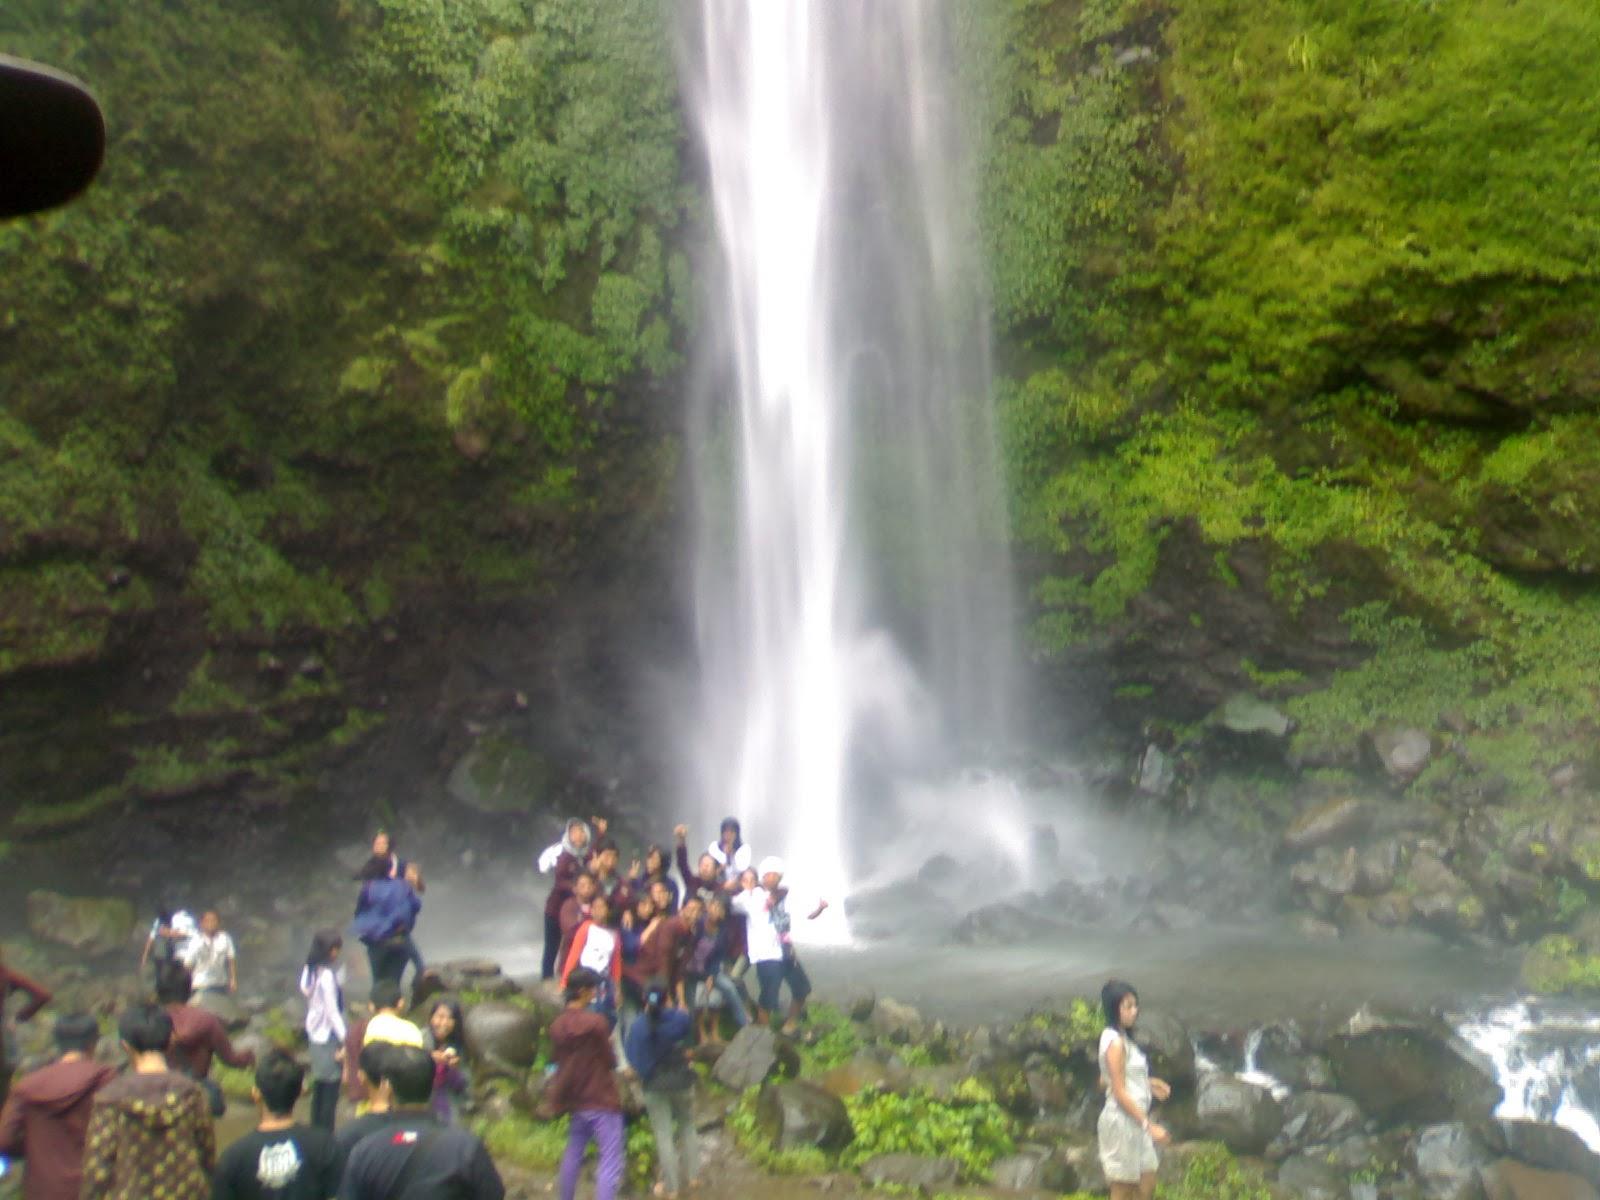 Tempat Wisata Malang Batu  - Coban Rondo